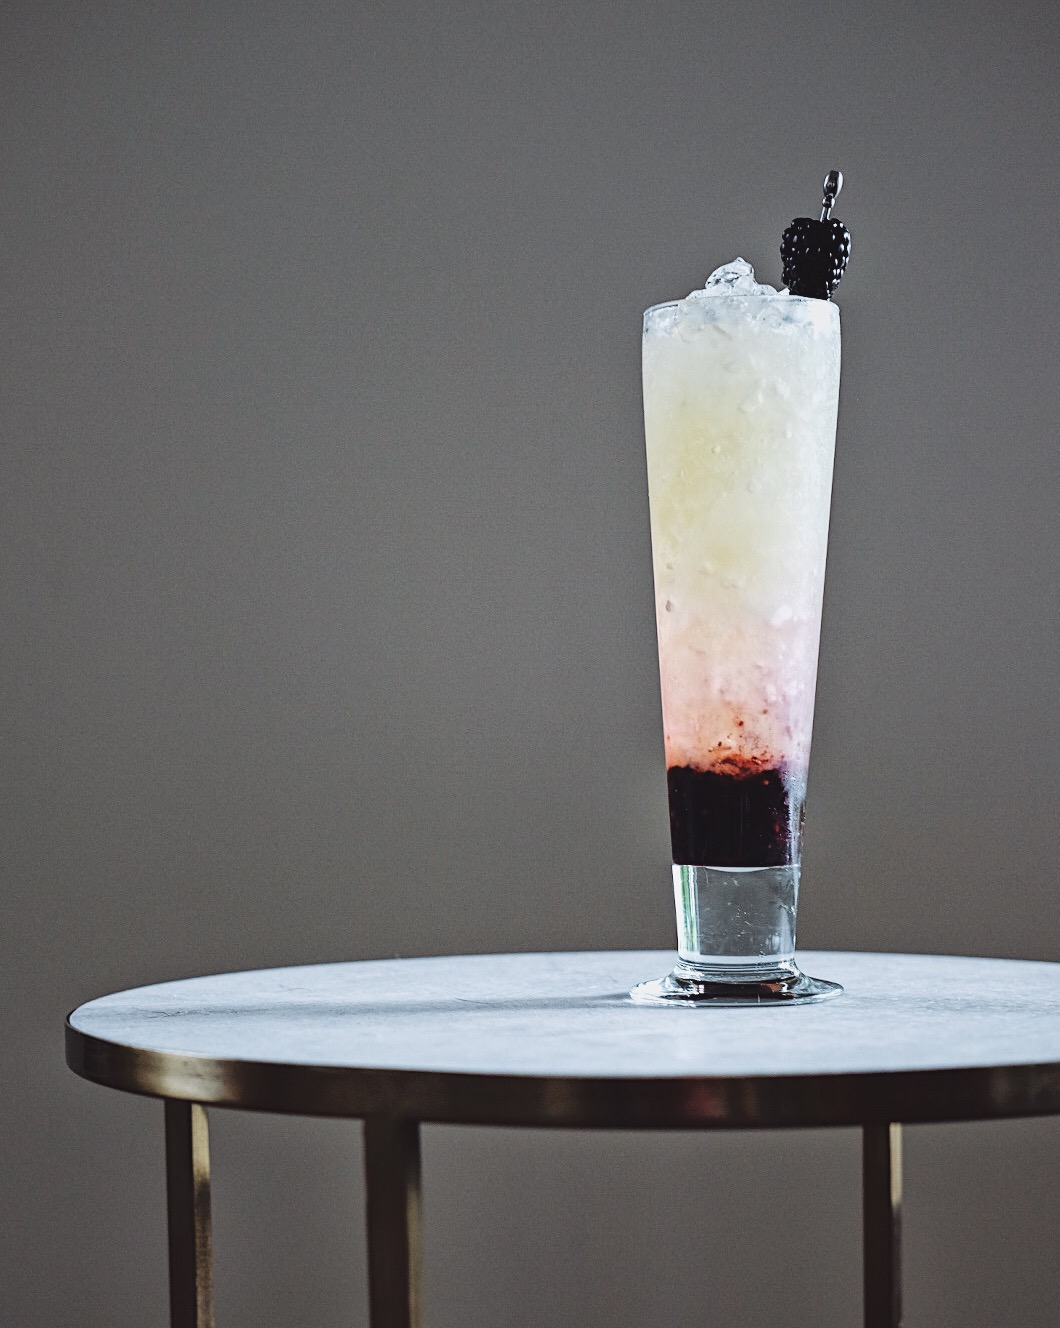 ingredients: - 2 oz silver rum3/4 oz fresh lemon juice1/2 ginger syrup1/2 oz orgeat1/4 oz honey syrup3 blackberriesPeychaud's bittersGarnish: skewered blackberry